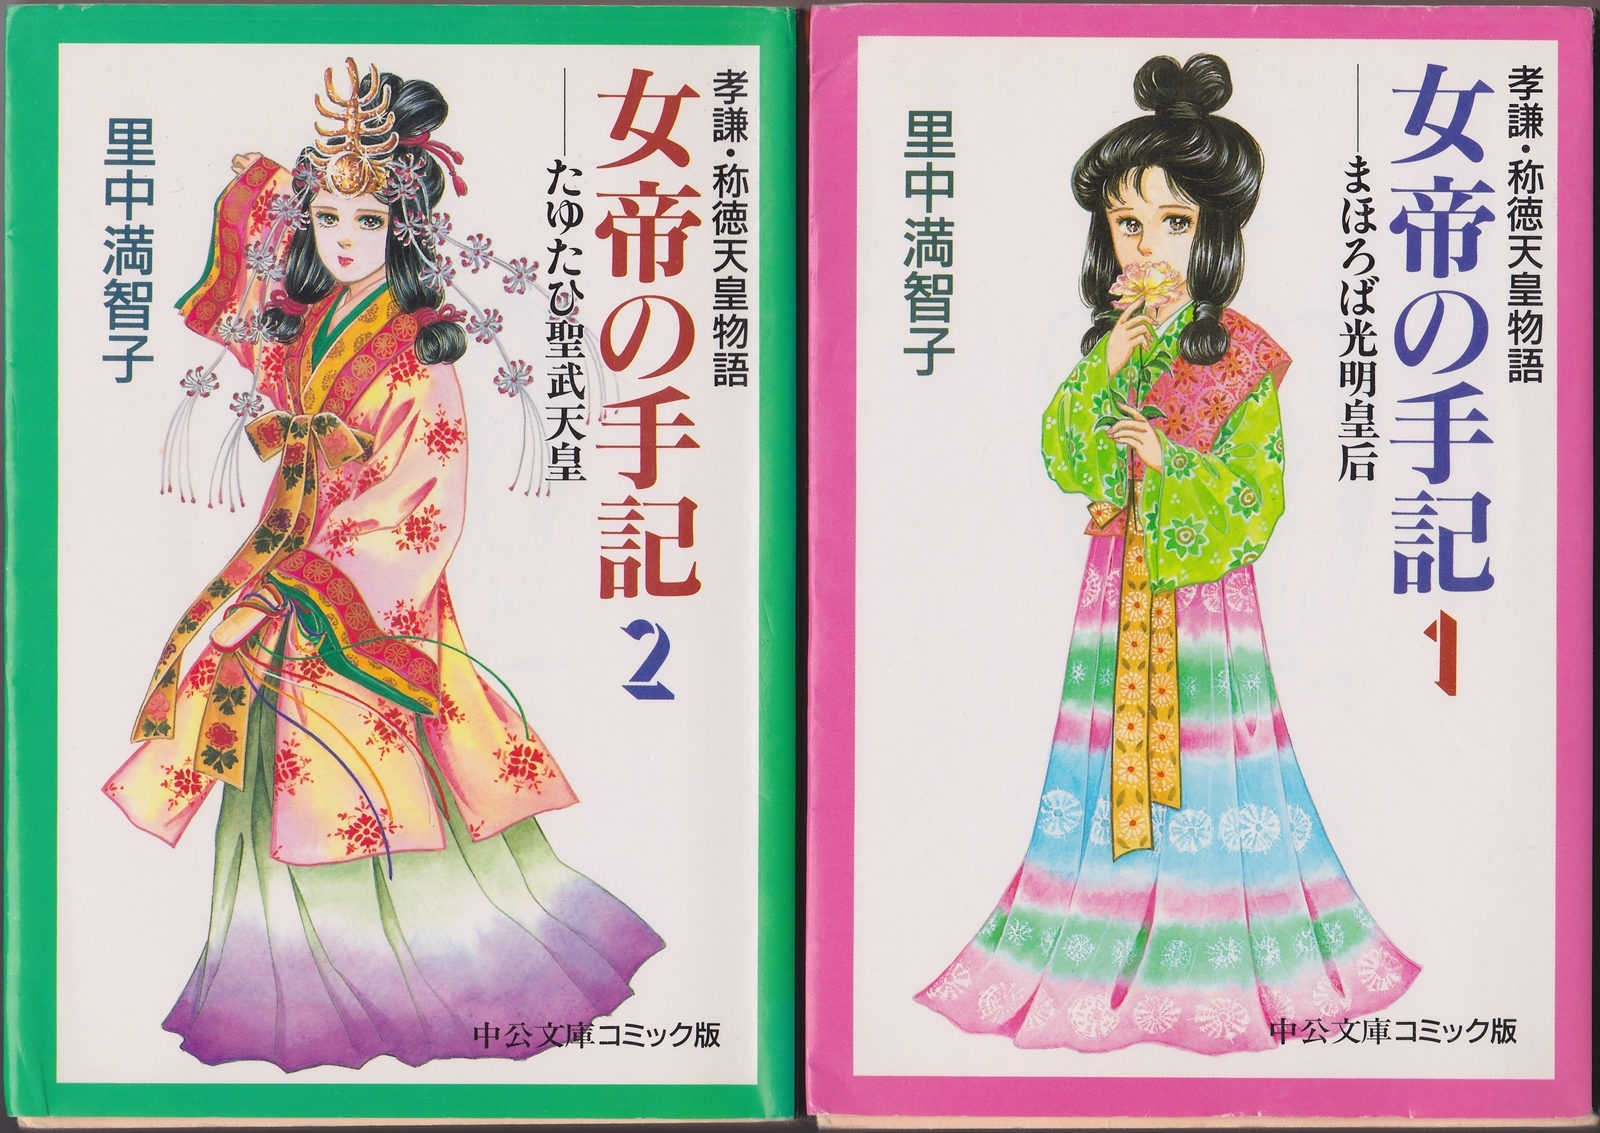 Jotei-no-shuki-cover12.jpg